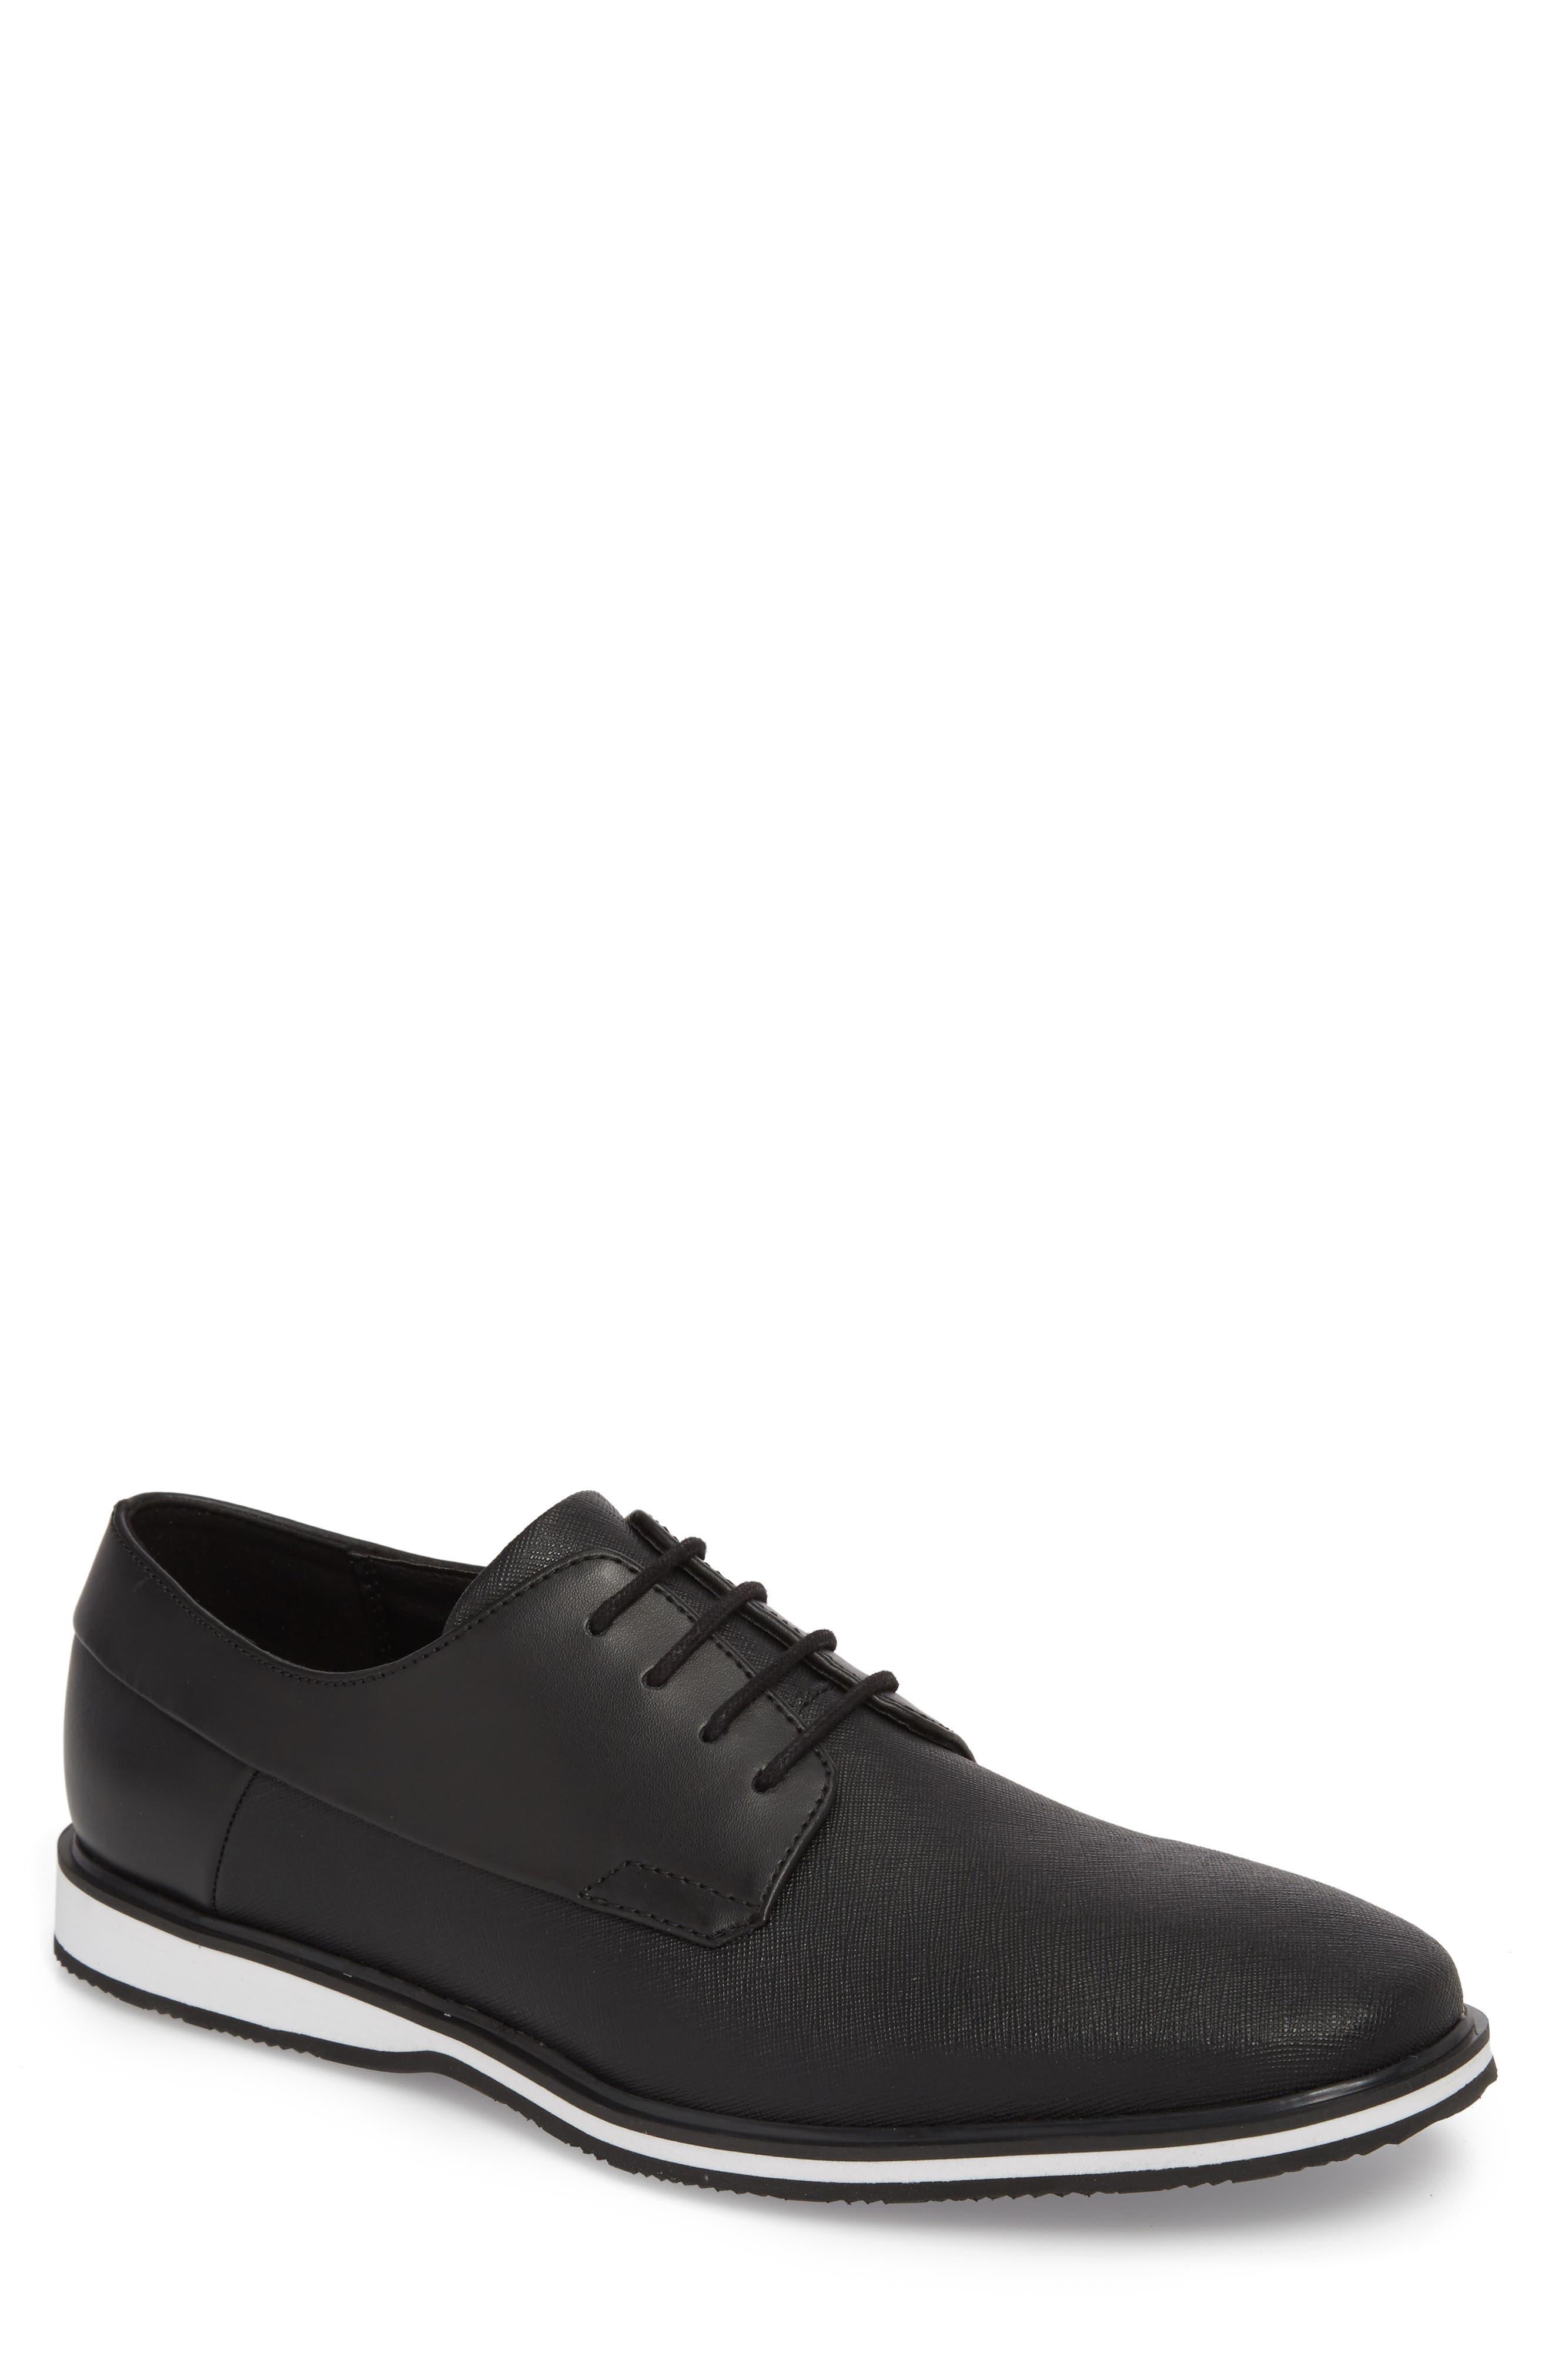 Wilfred Plain Toe Derby,                         Main,                         color, Black